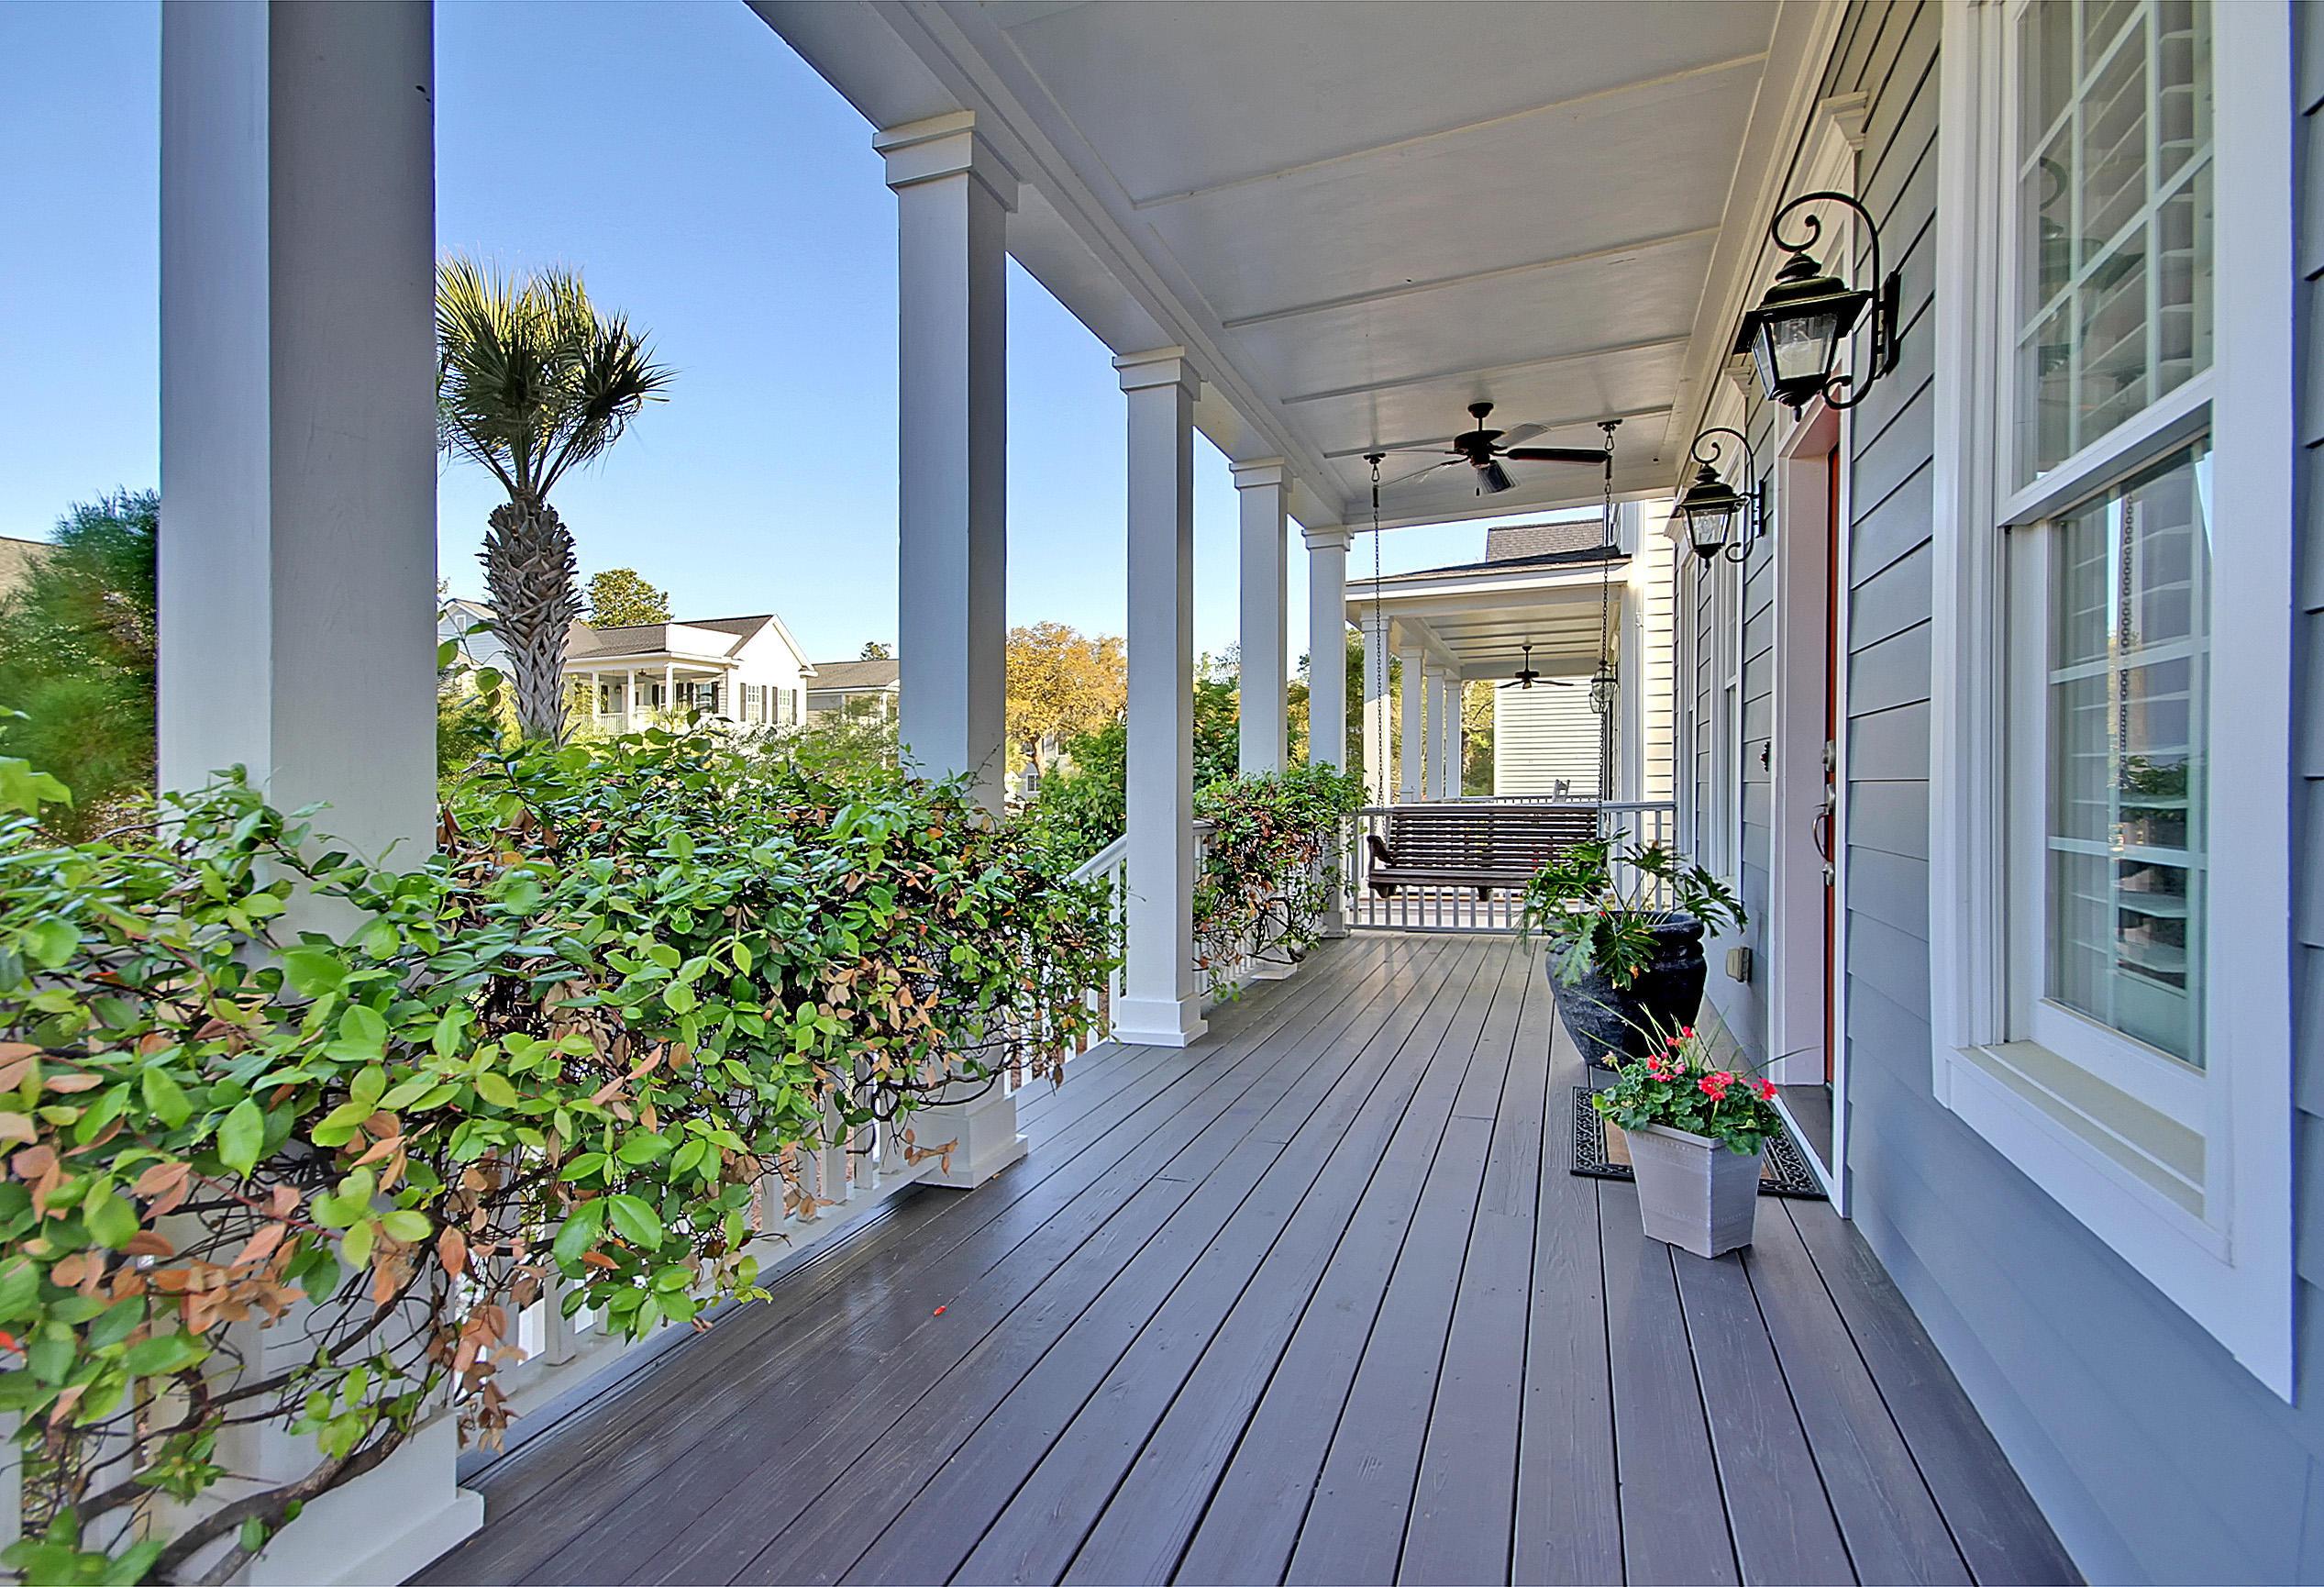 Cloudbreak Court Homes For Sale - 638 Cloudbreak, Charleston, SC - 29